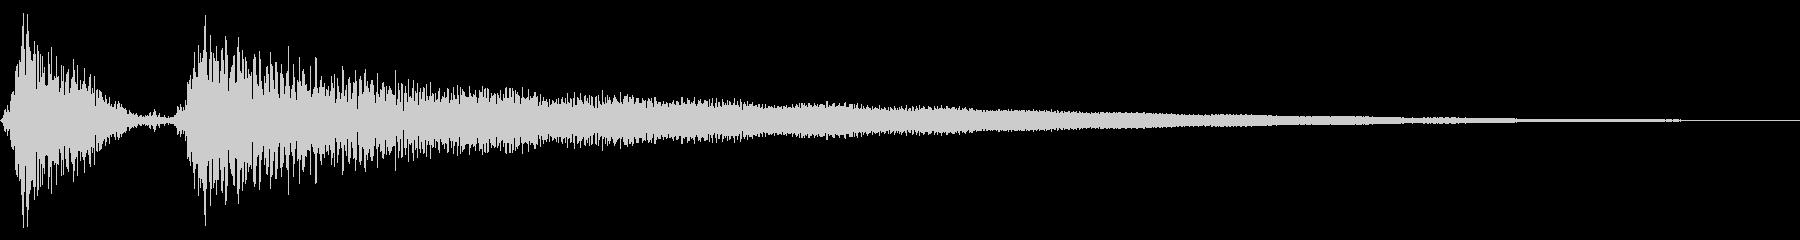 Moist stroke nylon guitar's unreproduced waveform